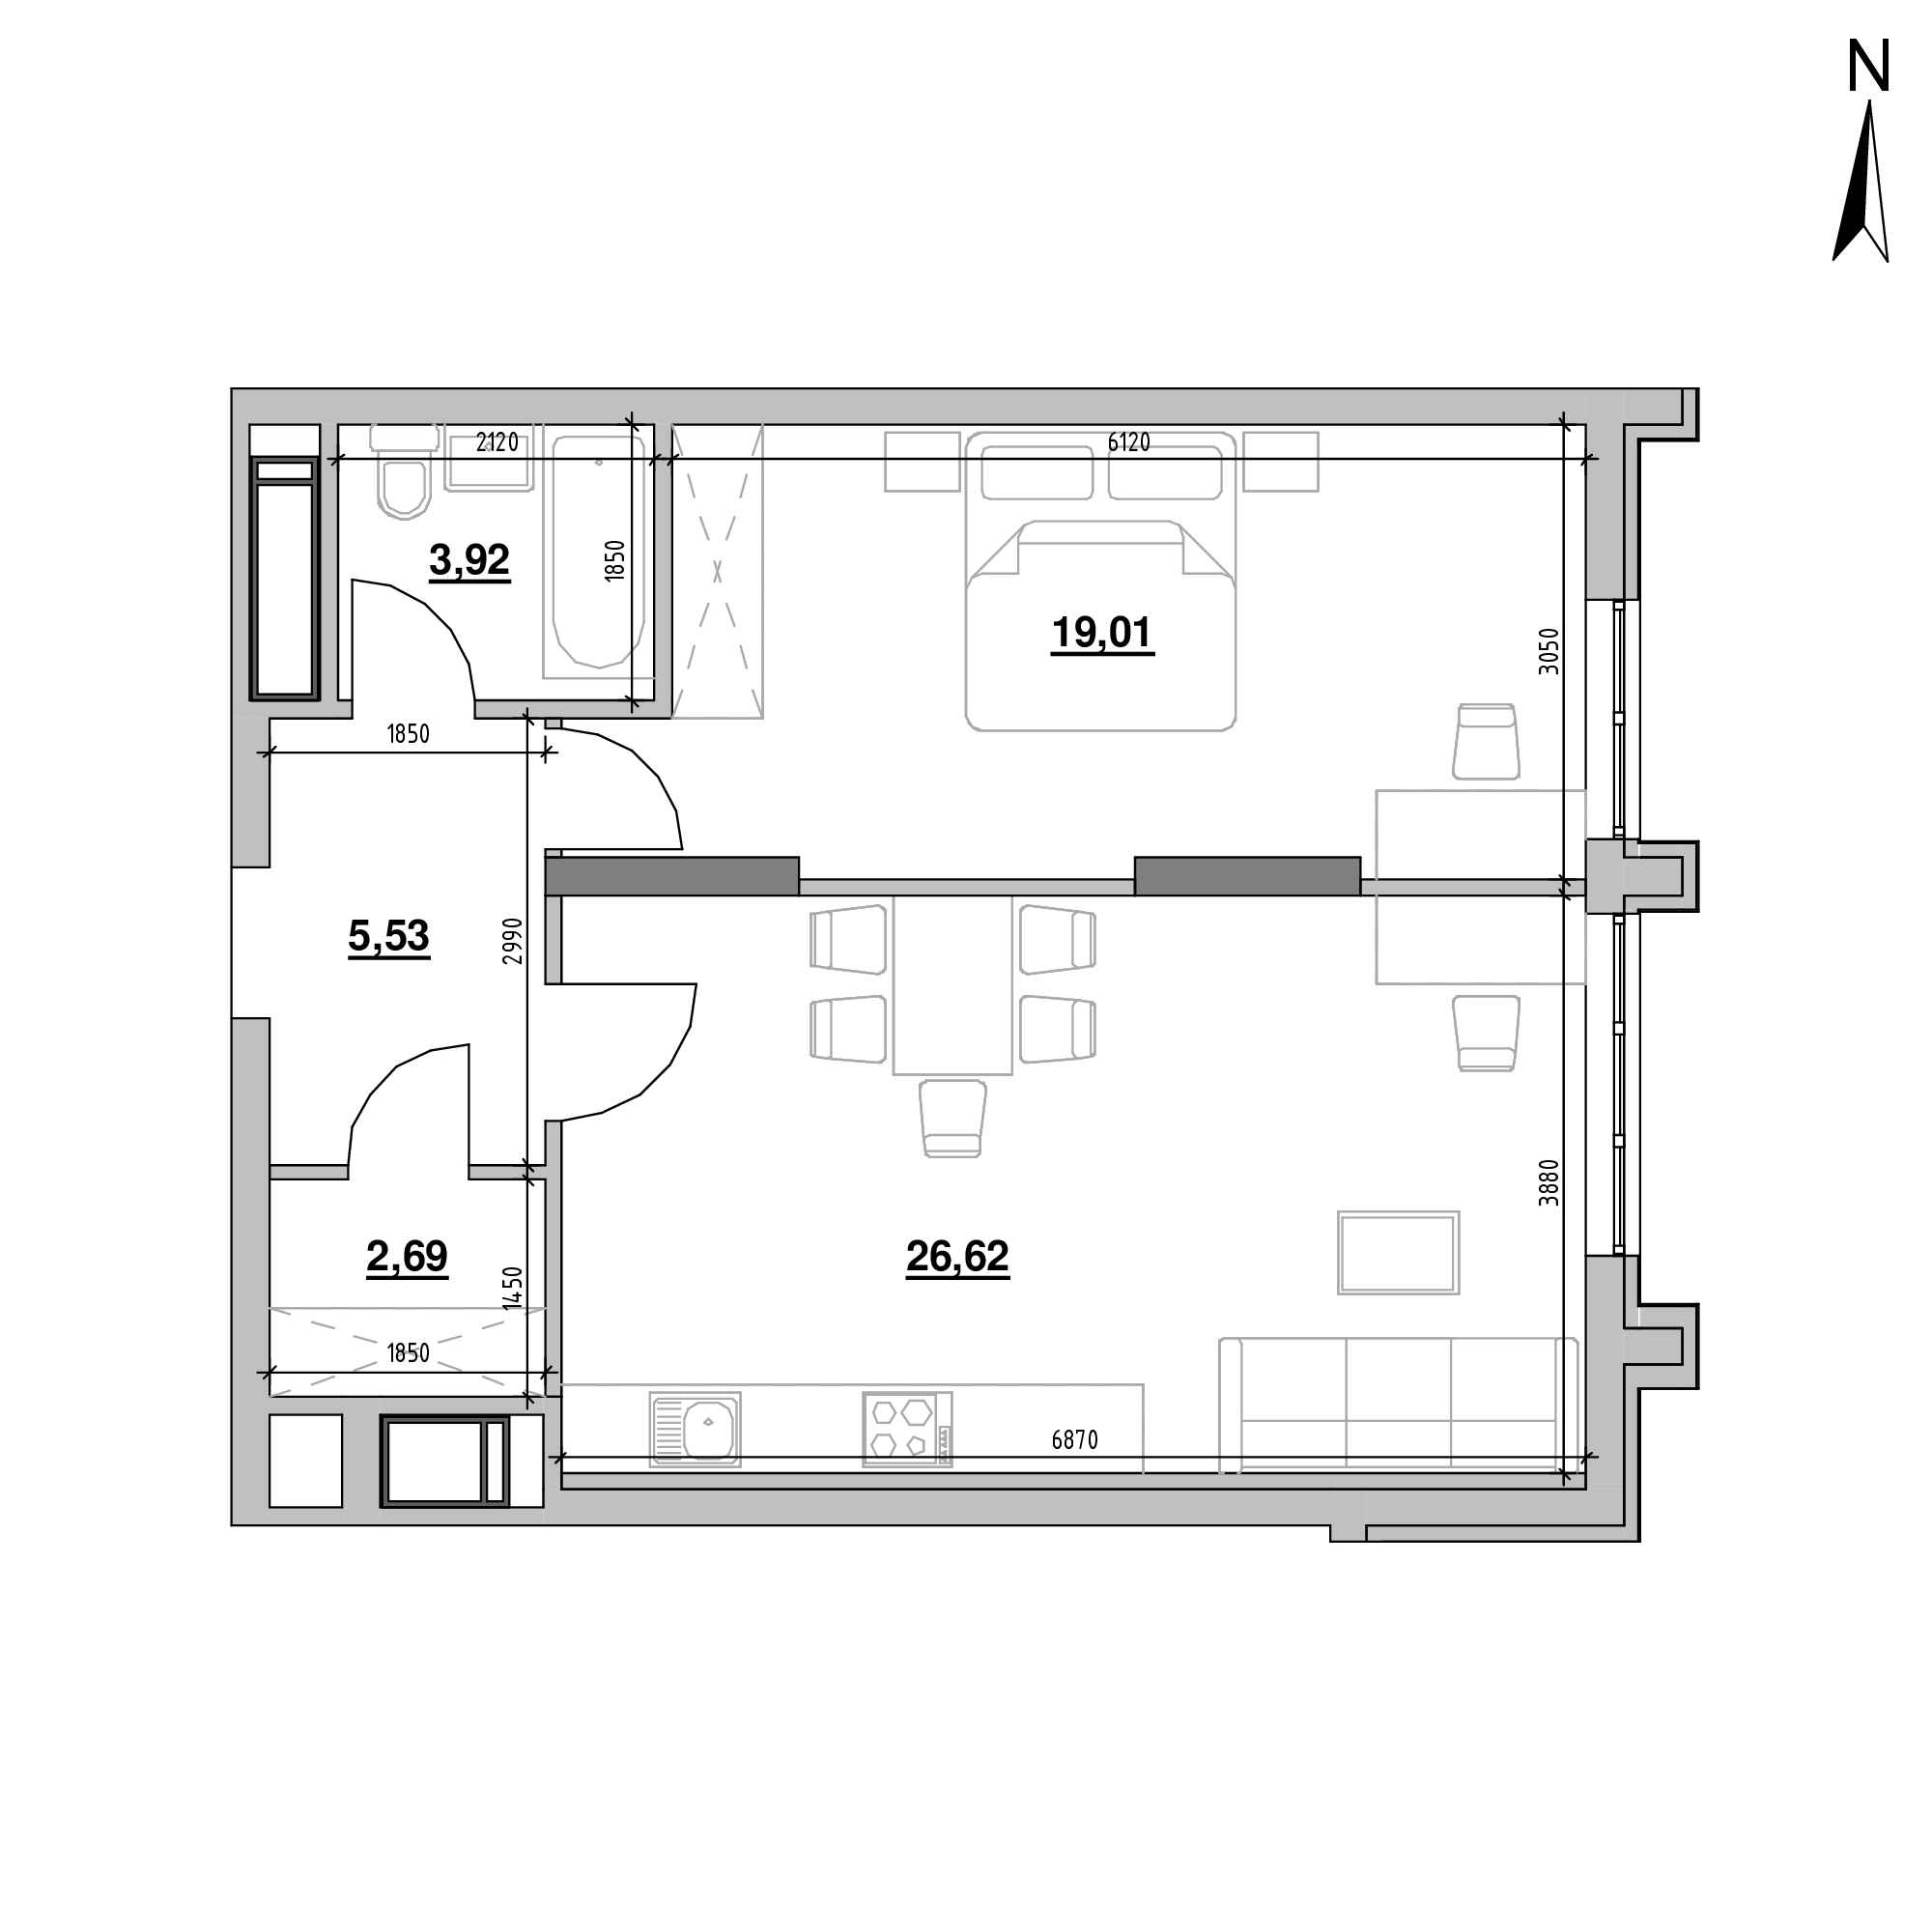 ЖК Nordica Residence: планування 1-кімнатної квартири, №207, 57.77 м<sup>2</sup>